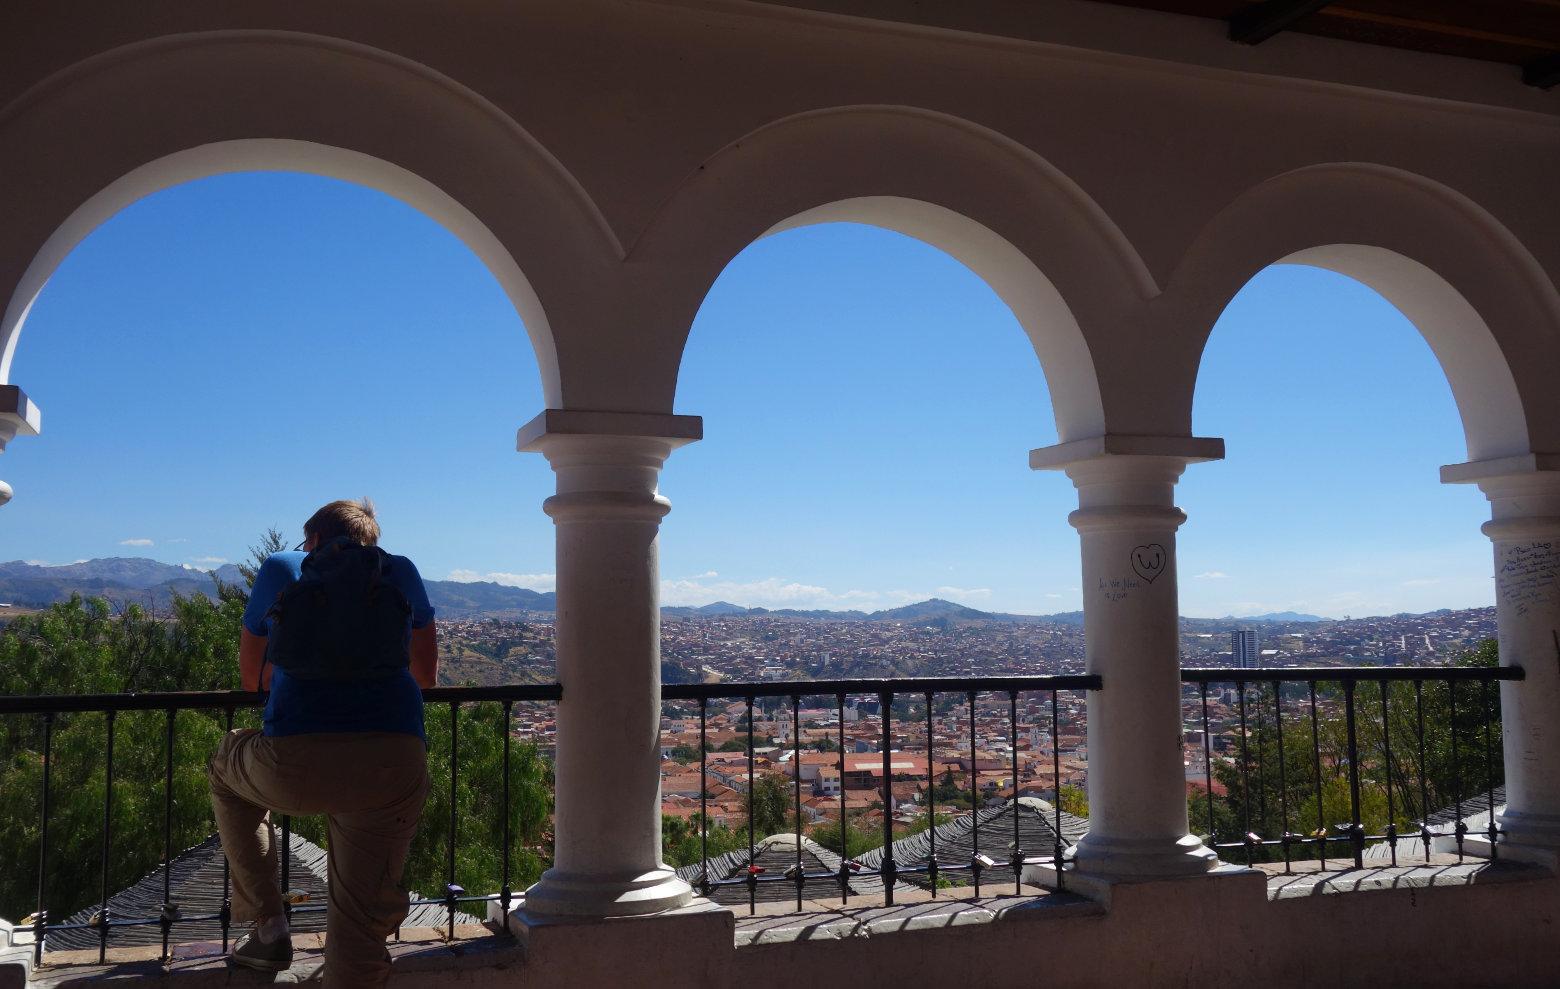 Bolivien Sucre Recoleta Blick auf Stadt